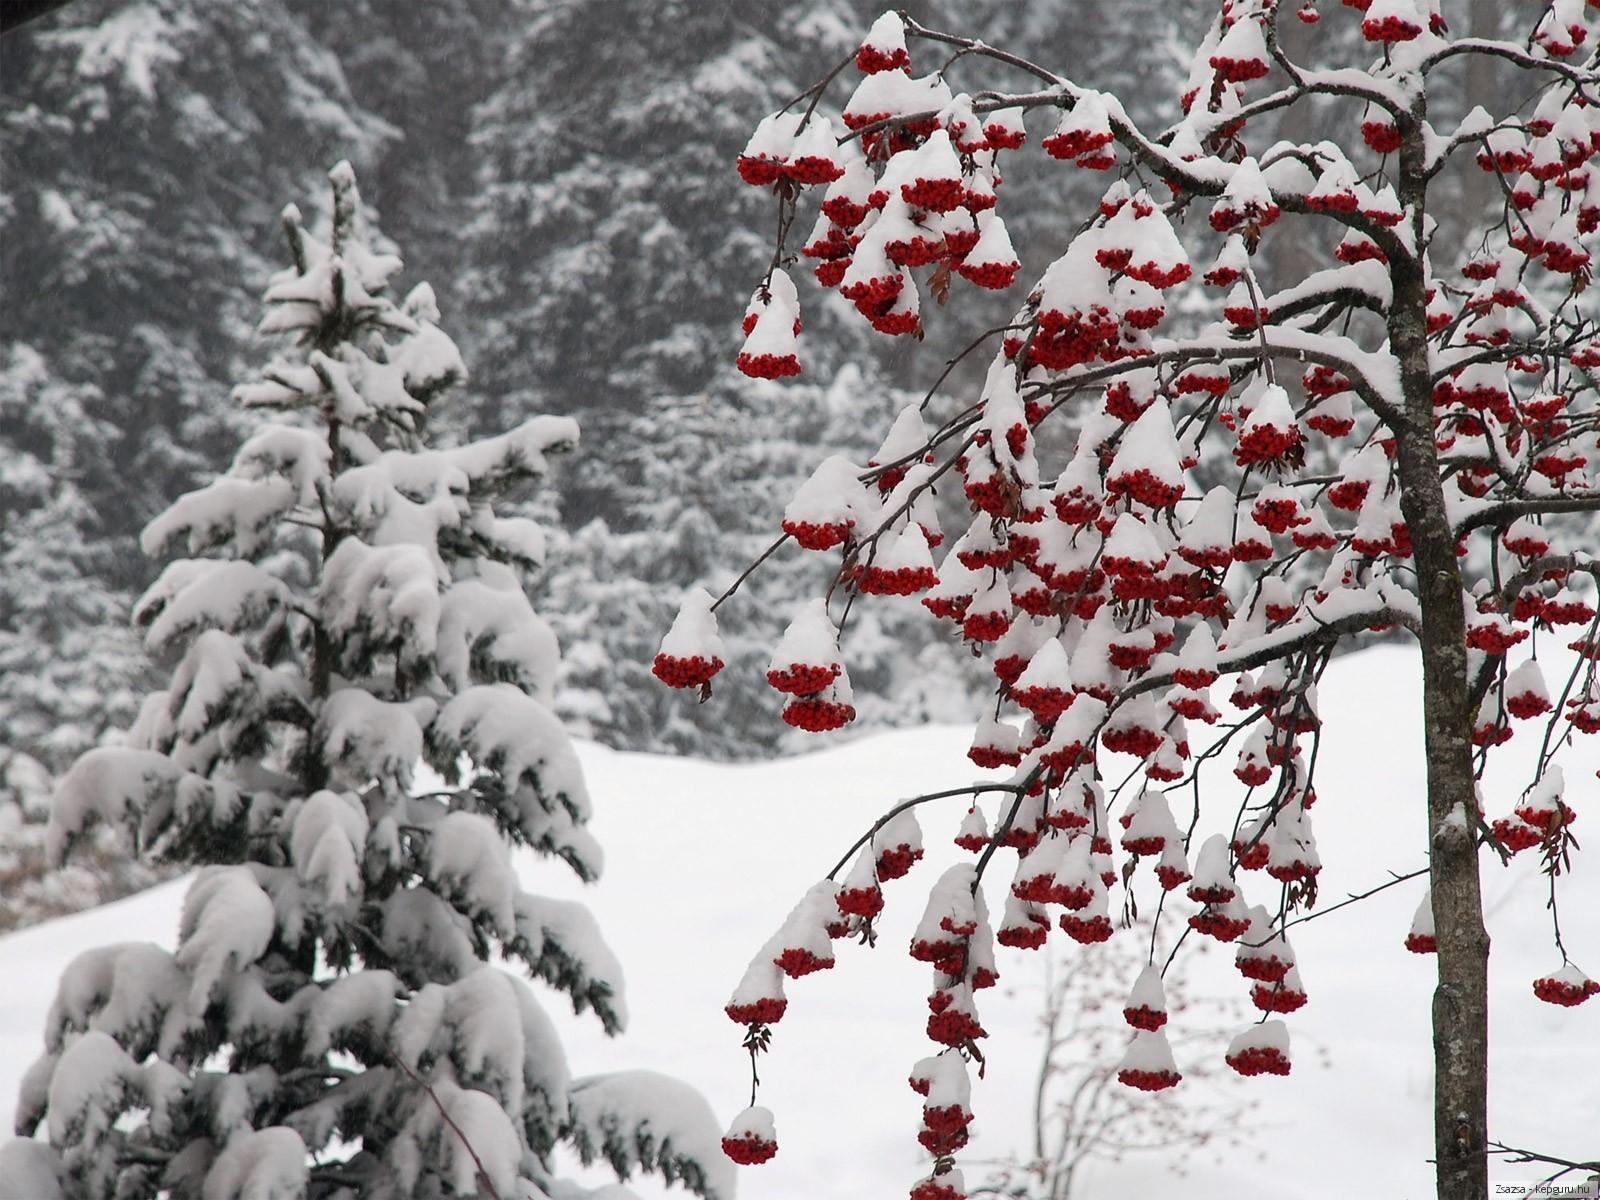 Wallpaper ไหนว่าปีนี้จะหนาวสุดในรอบ 30 ปี 50 Pic 228866-svetik